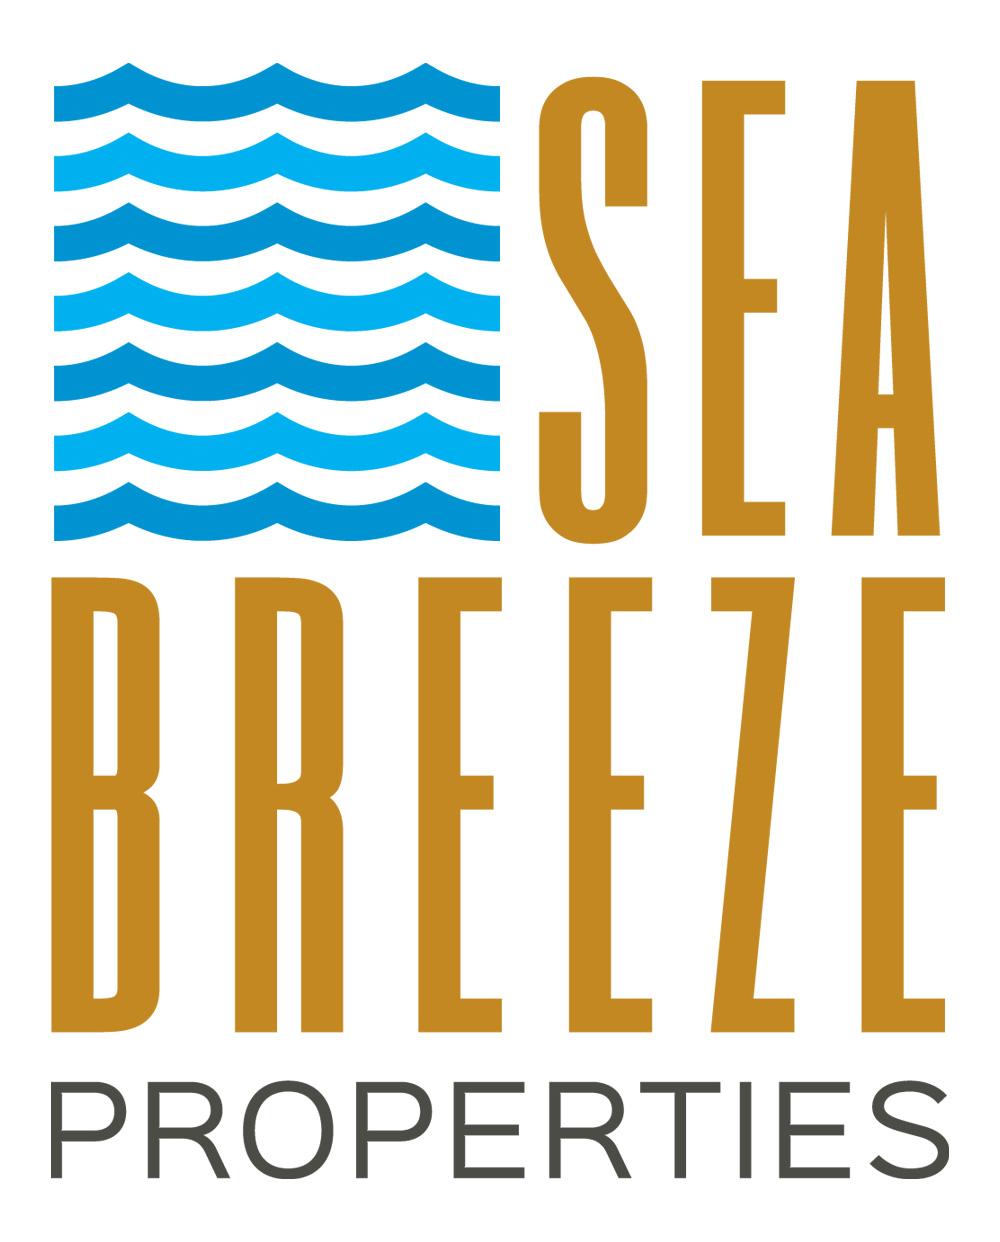 seabreeze_properties_logo.jpg